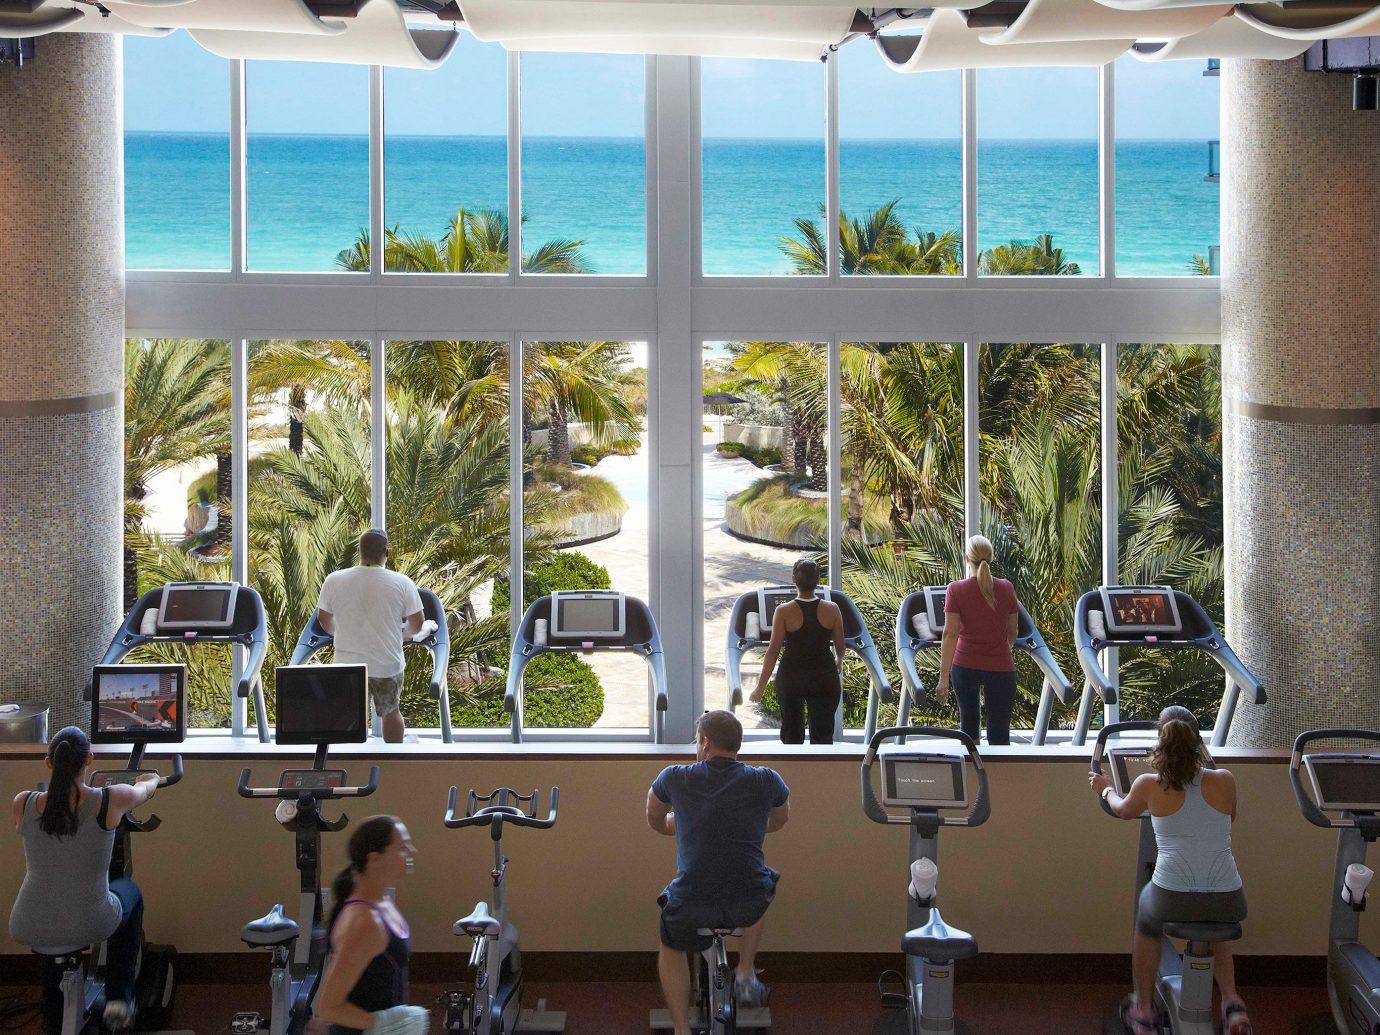 Beachfront Fitness Hotels Scenic views Sport Wellness structure room interior design Resort restaurant window covering several